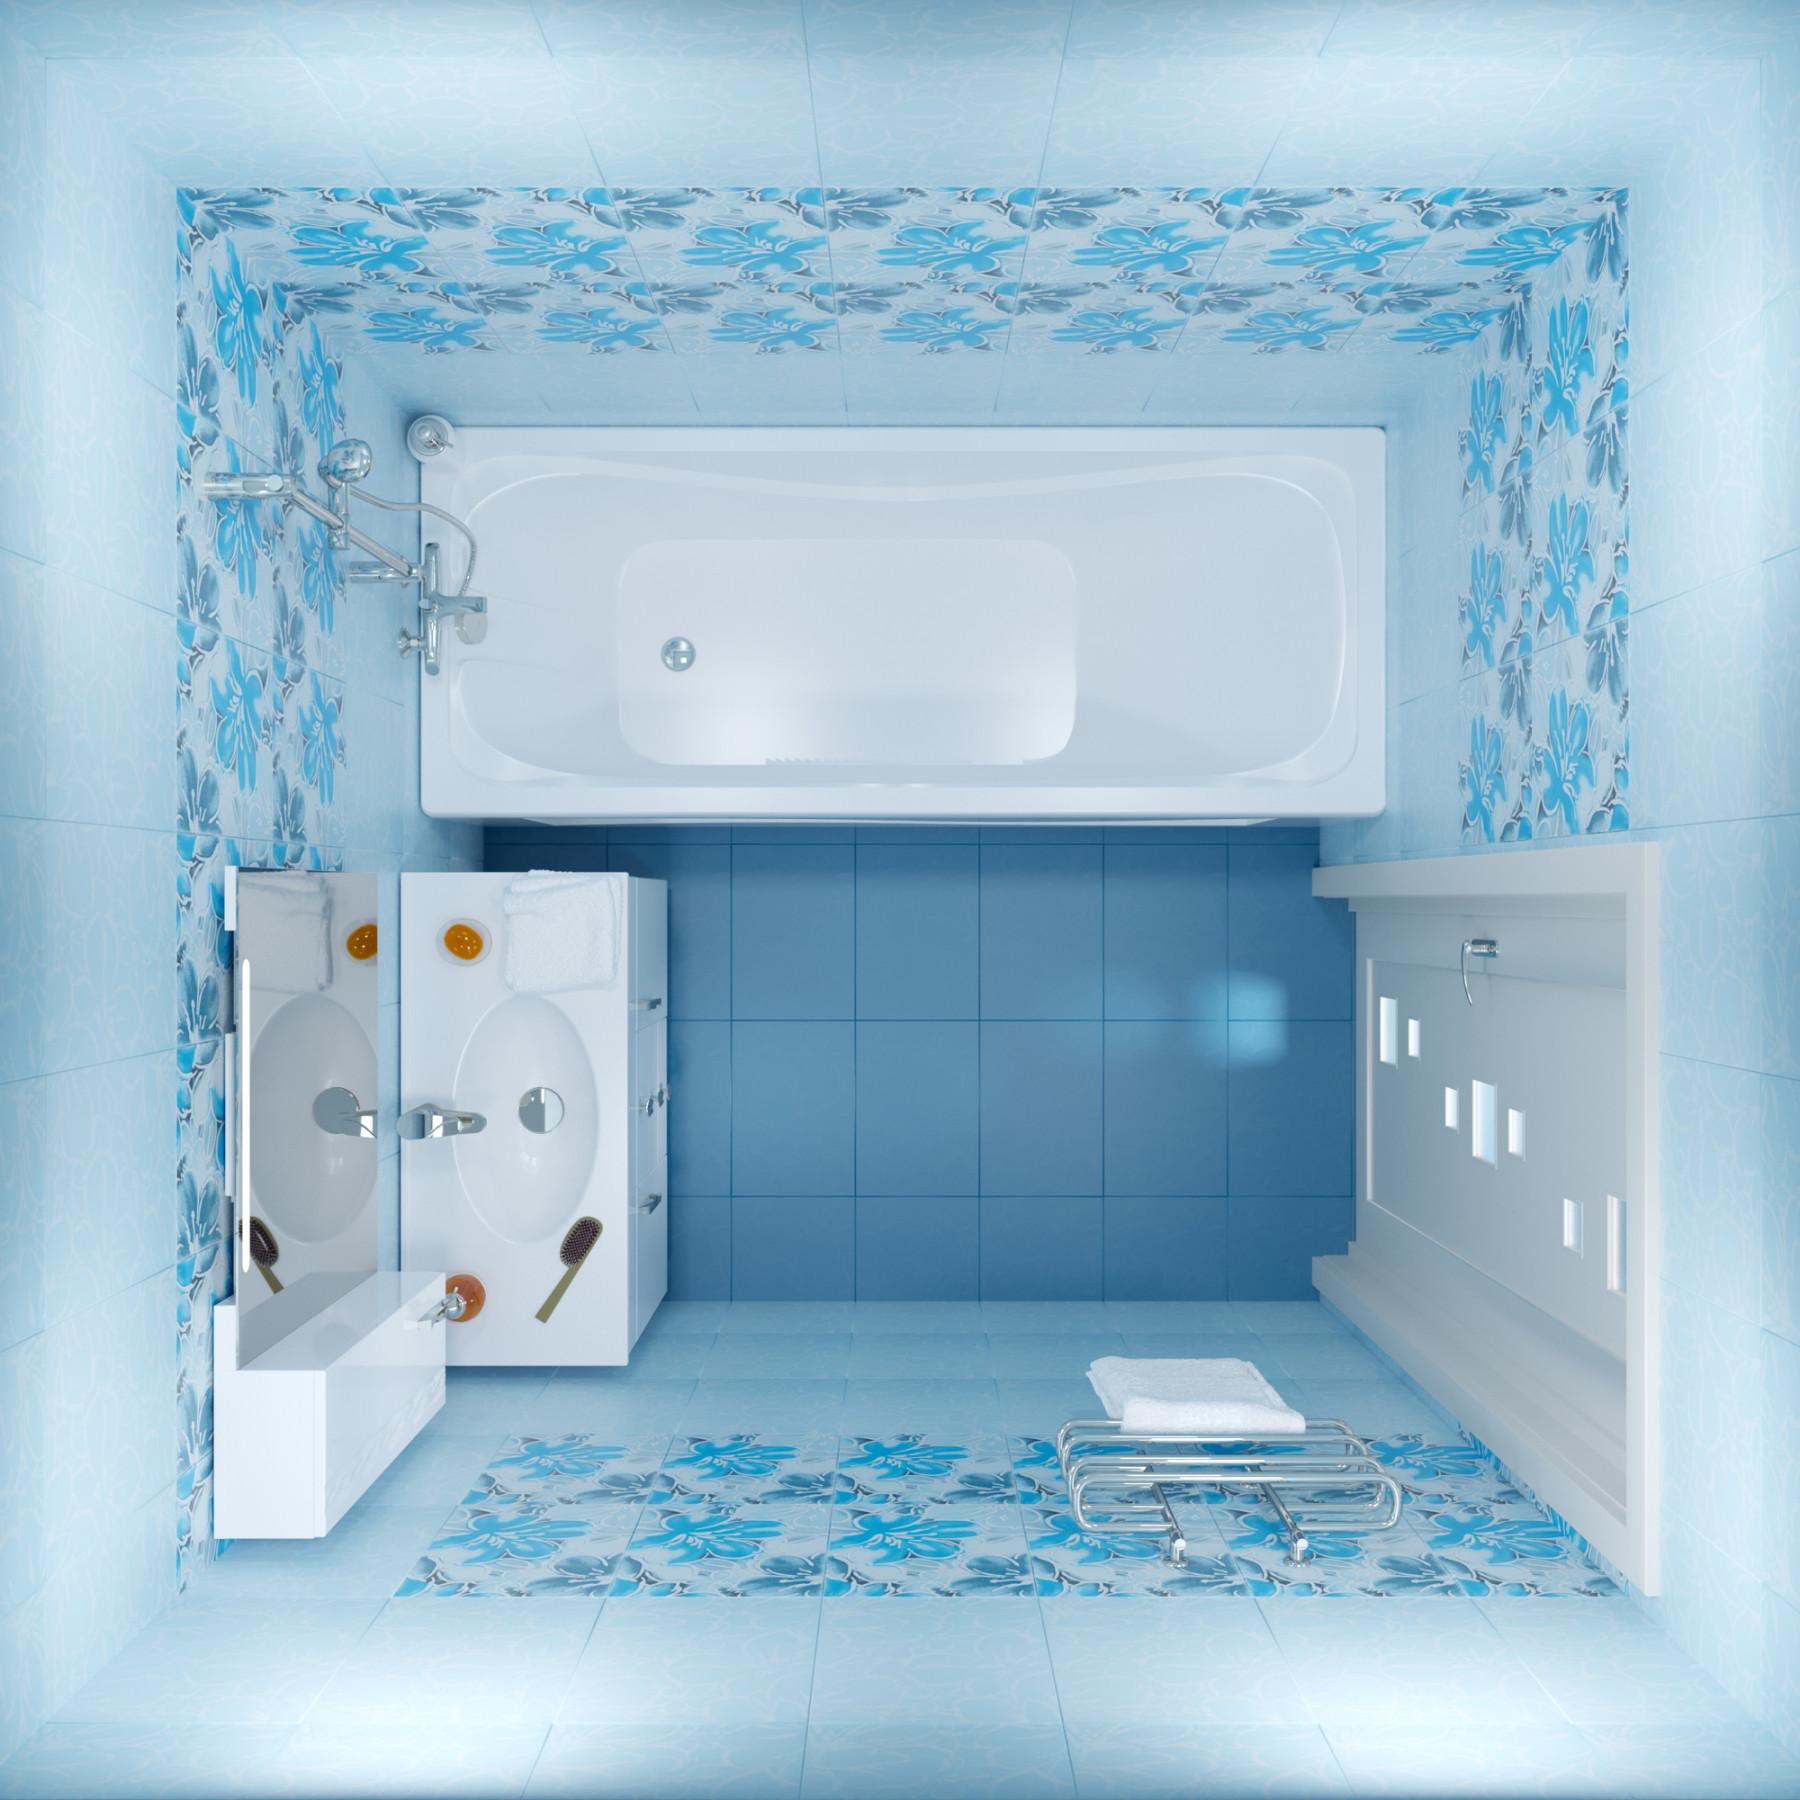 Акриловая ванна Triton Стандарт 160x70